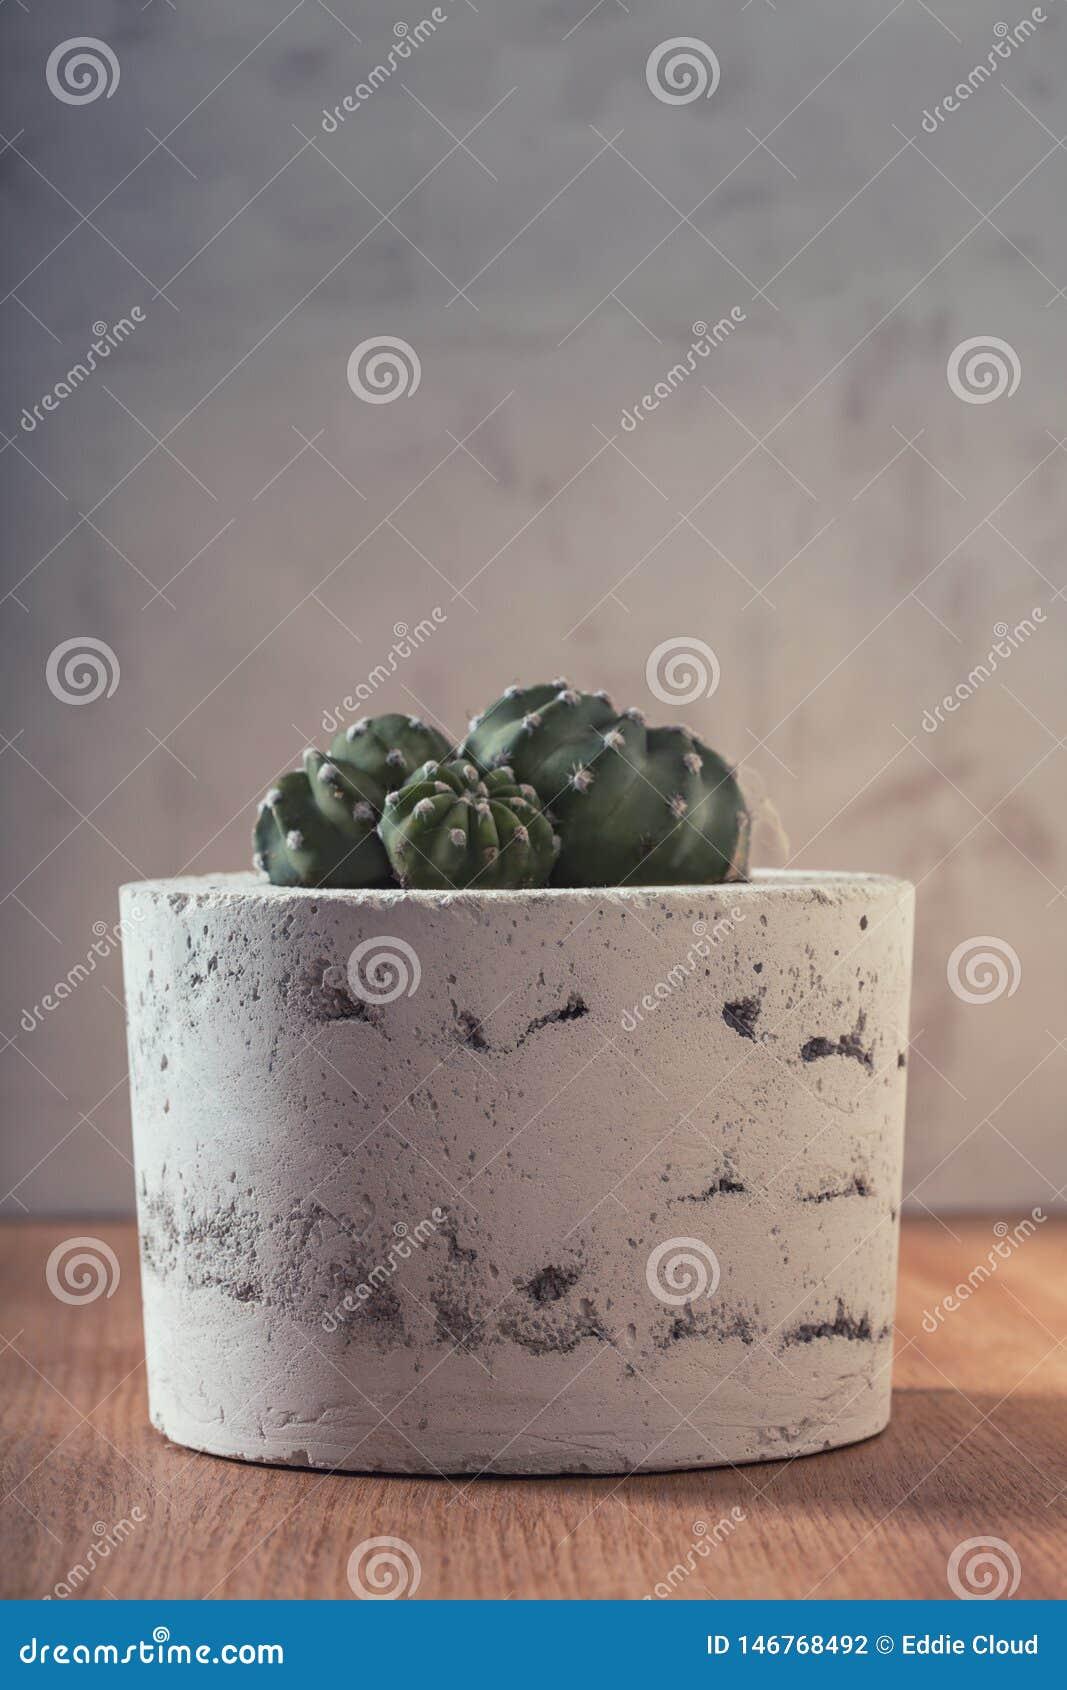 Succulent στο χειροποίητο συγκεκριμένο δοχείο